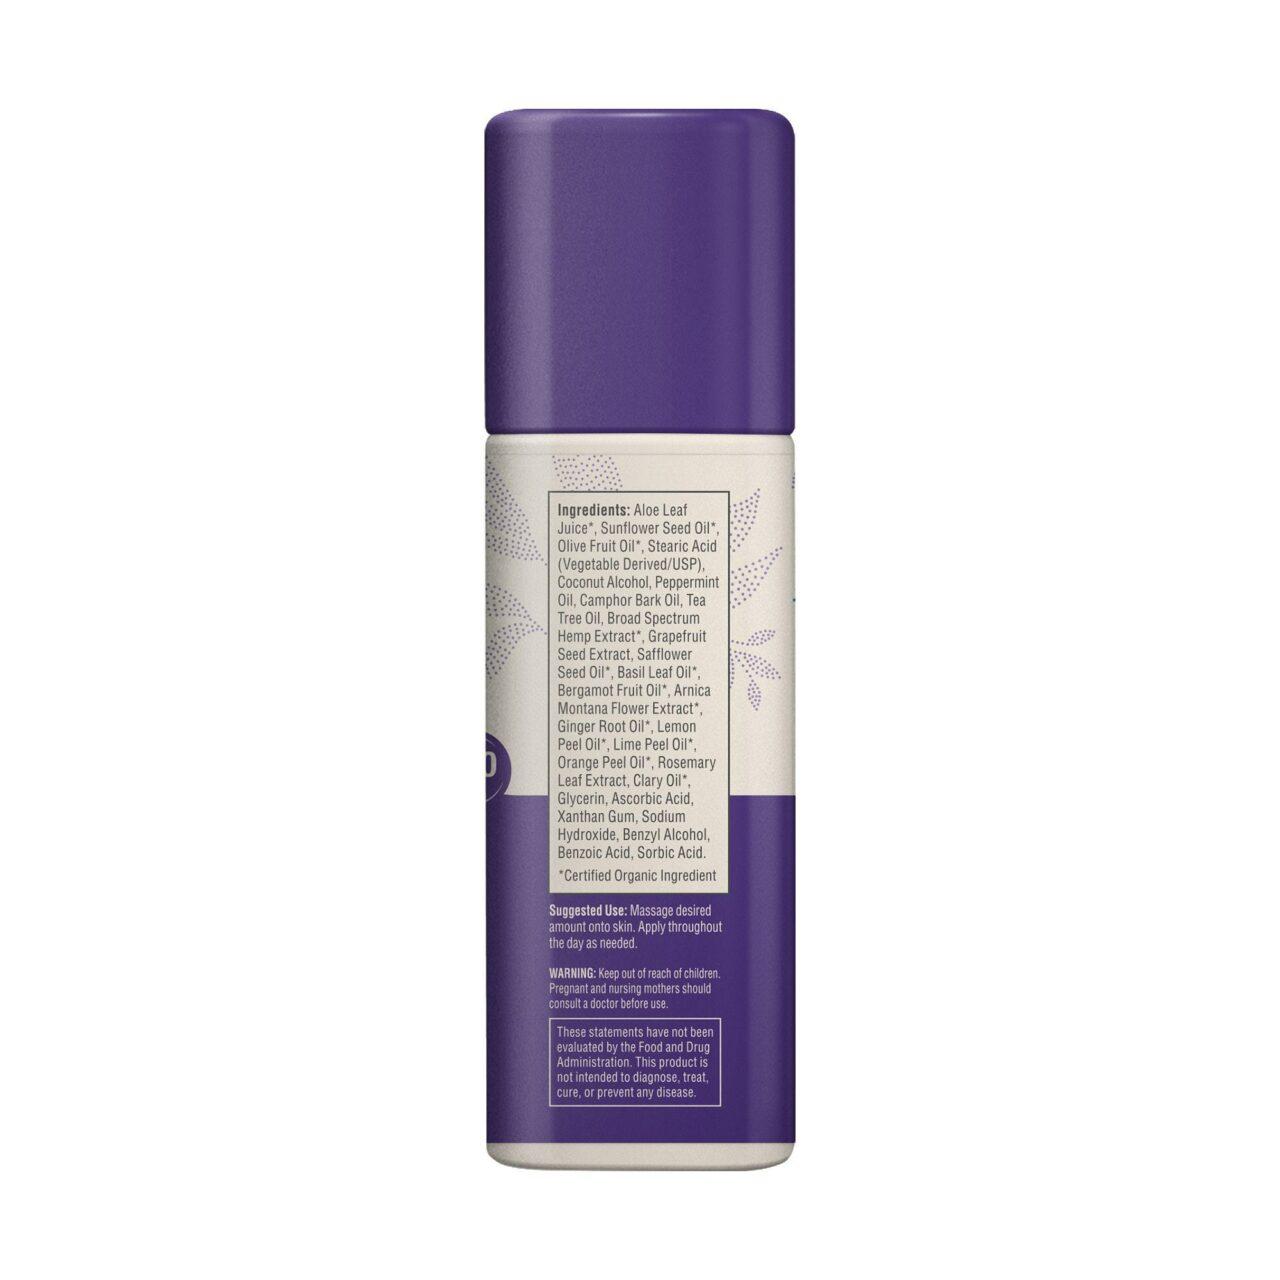 Medterra, Wellness Nature's Relief Daily CBD Cream, Broad Spectrum THC-Free, 1.7oz, 500mg CBD 4